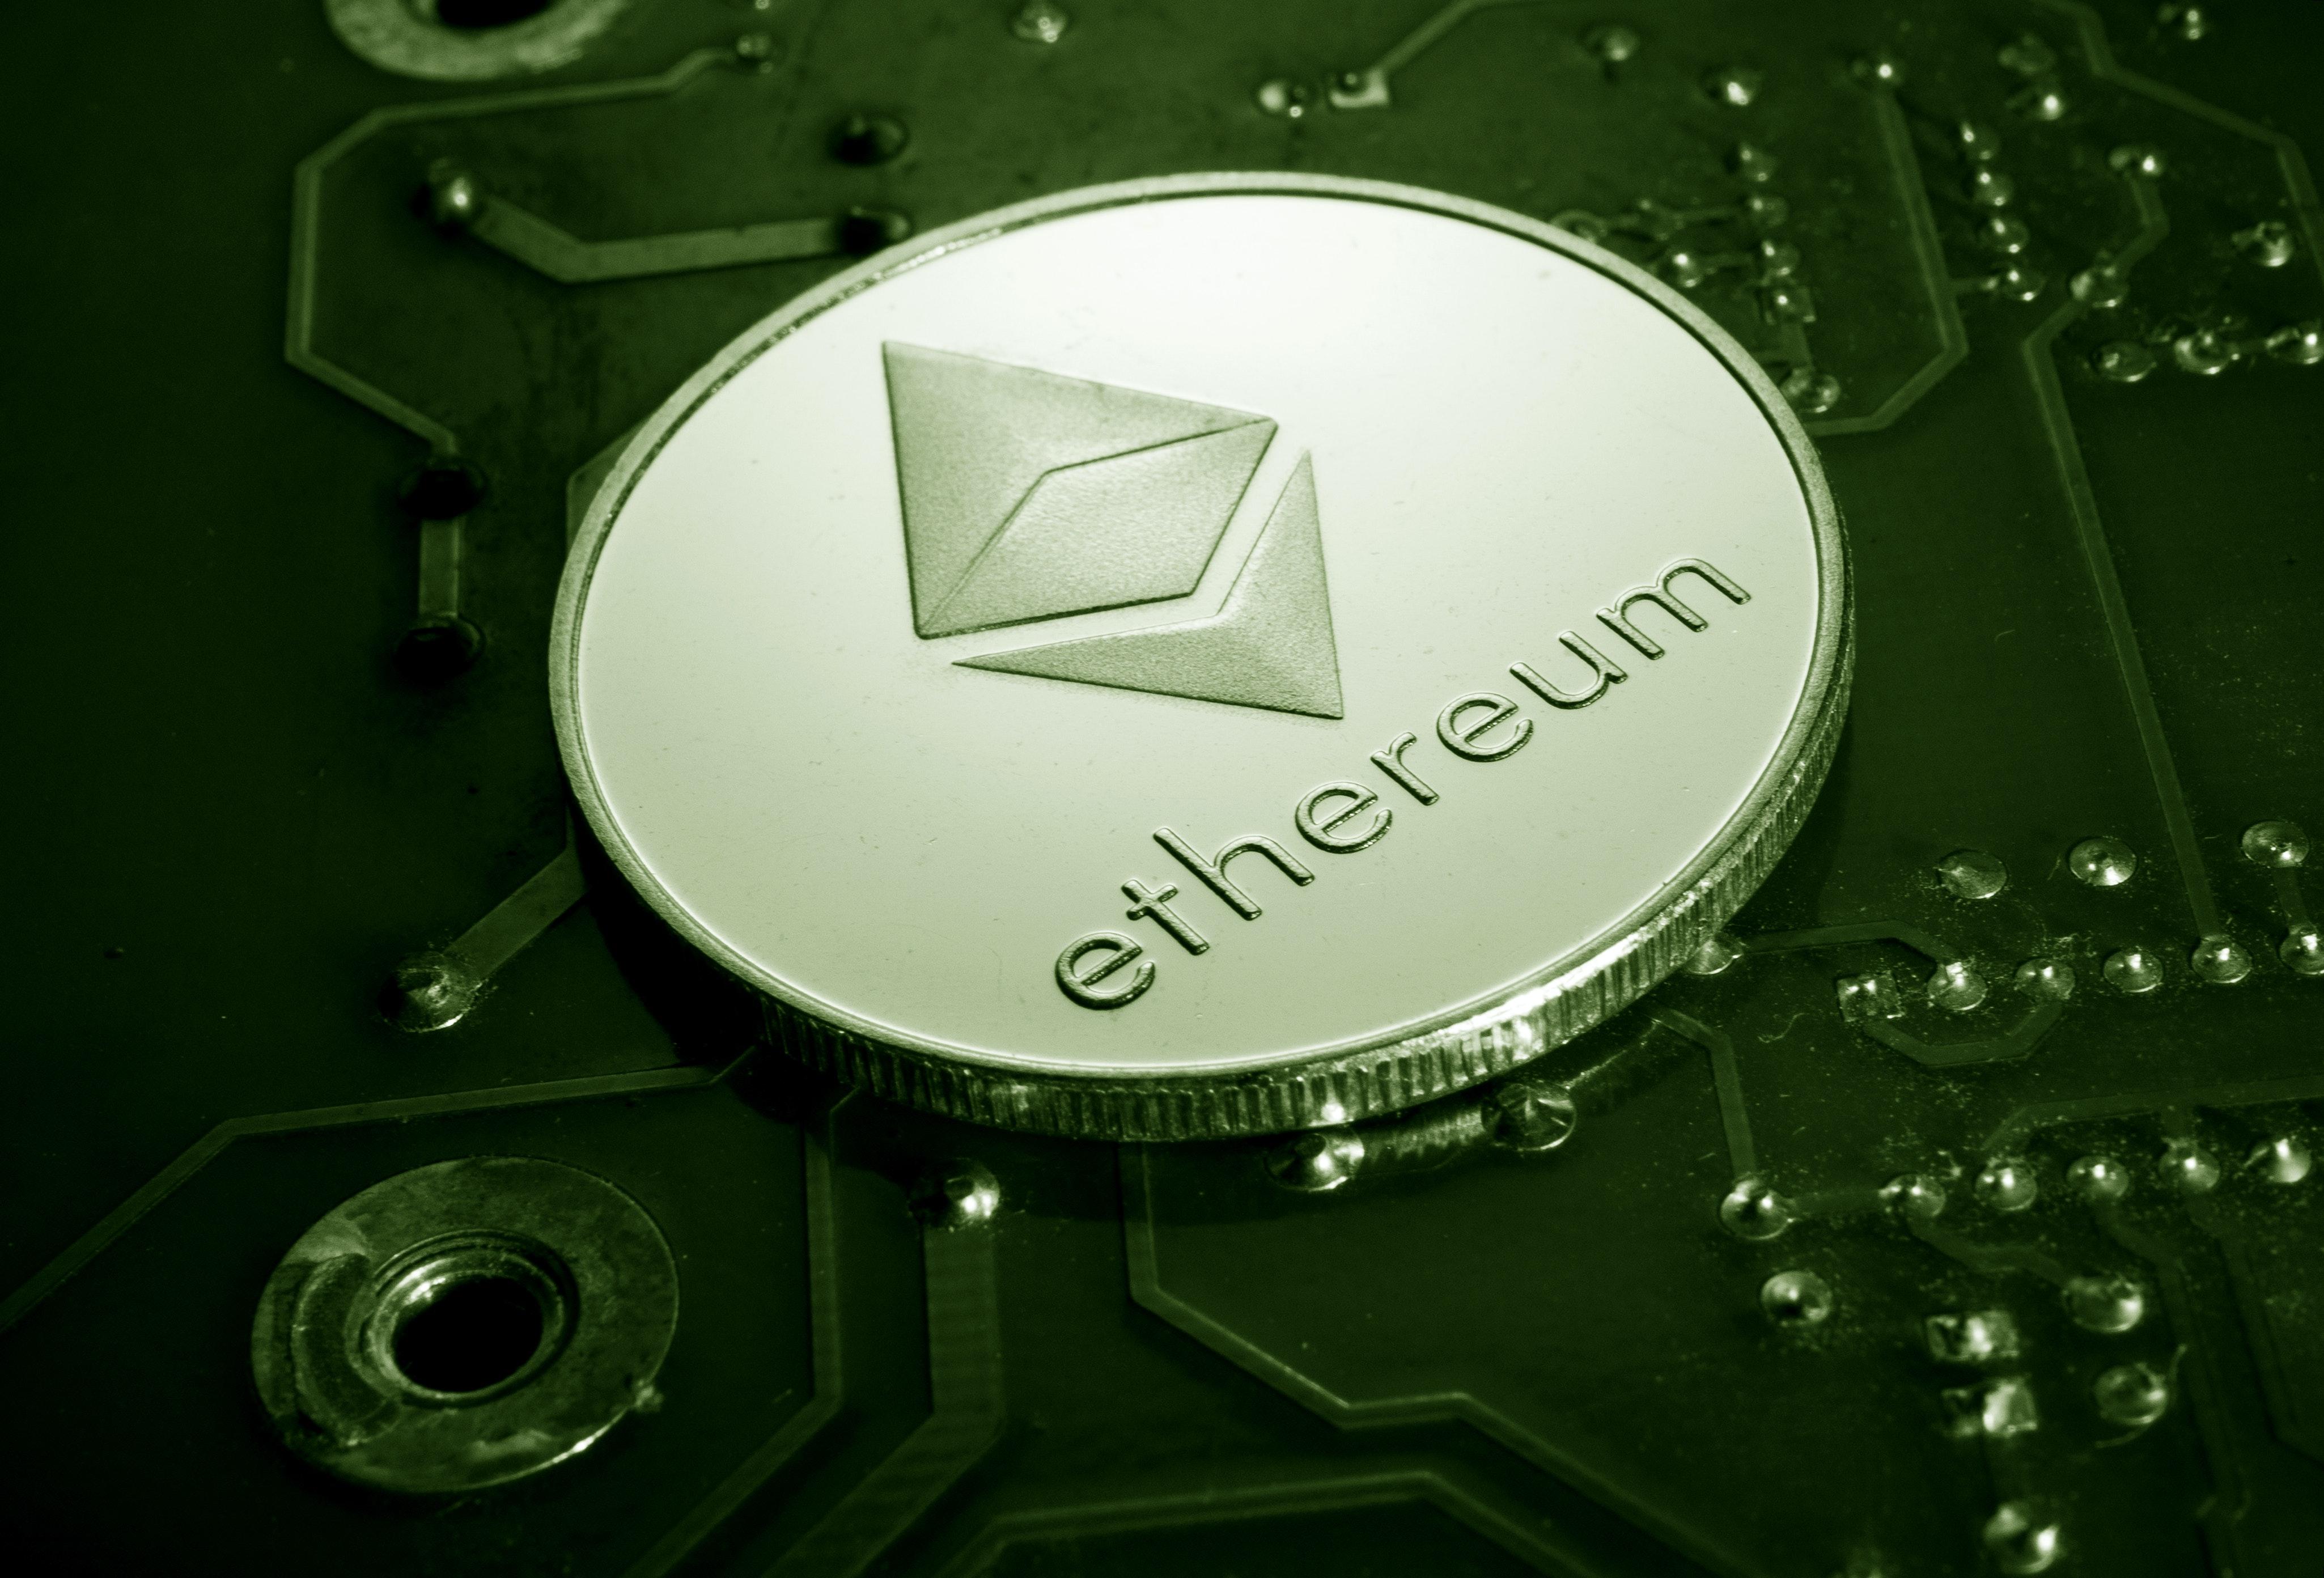 Nvidia Ethereum Mining GPUs Underperformed in Q2, Reveals Financial Report